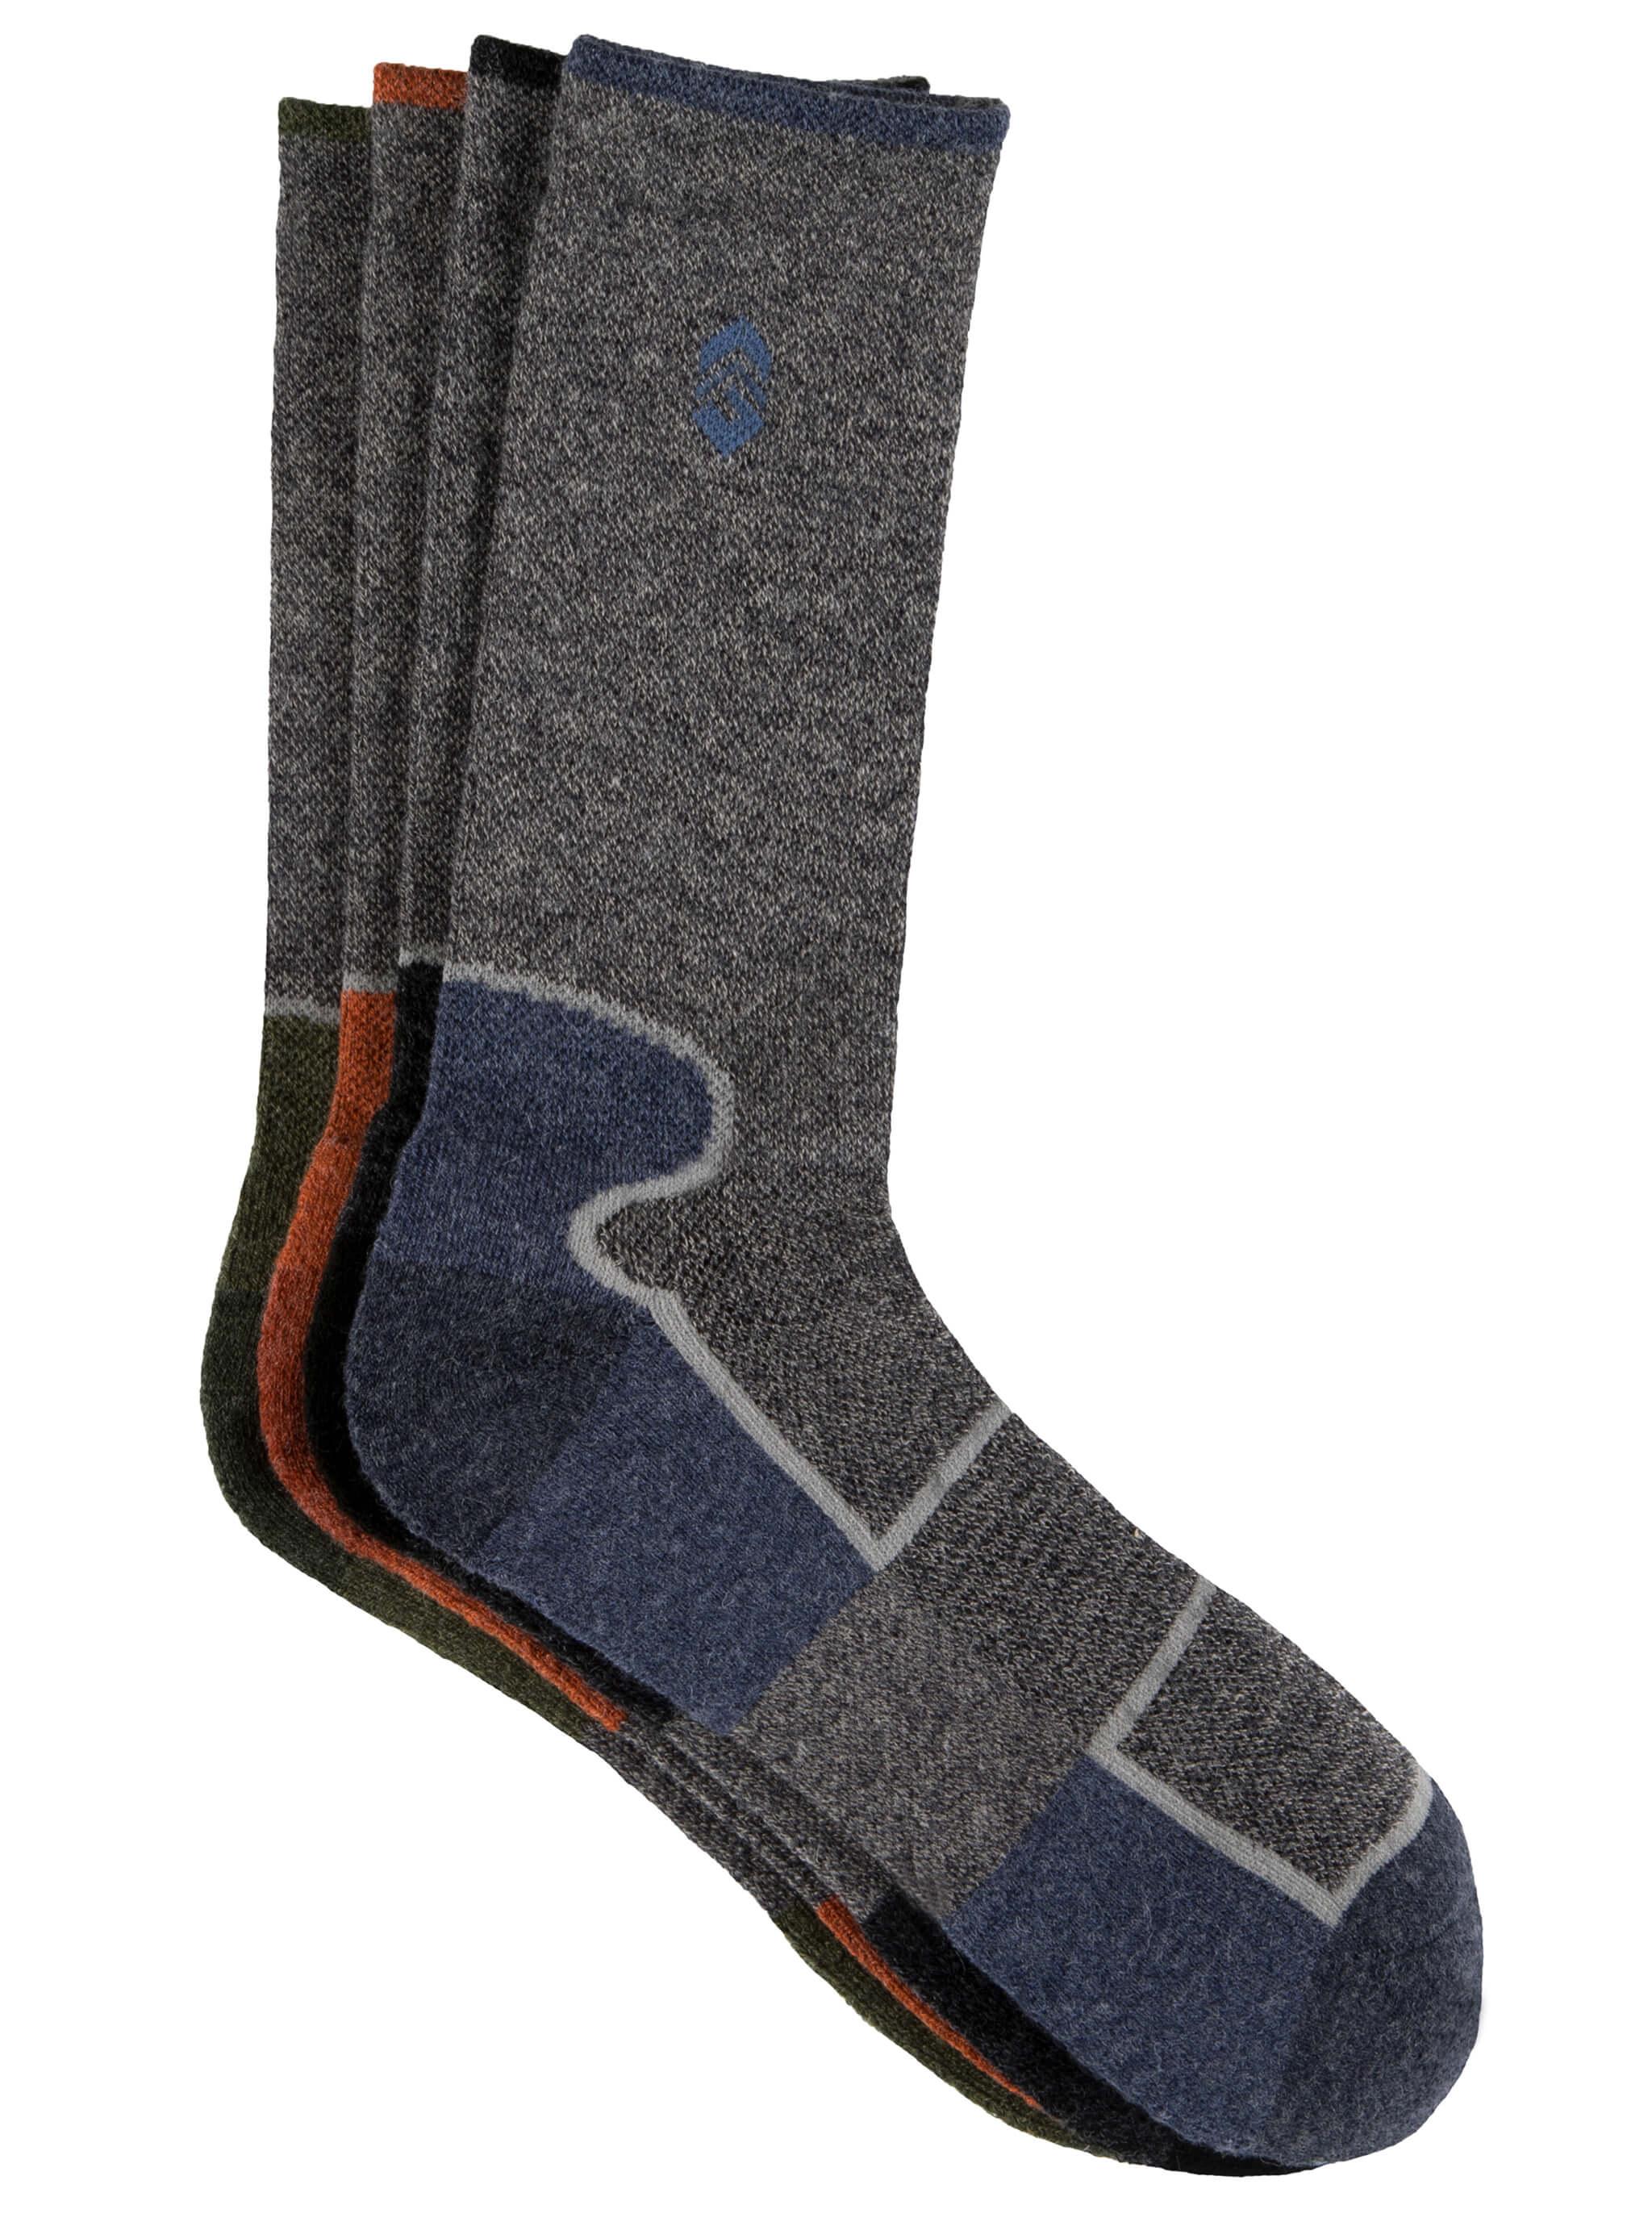 Men's Wool-Blend Colorblock Crew Socks